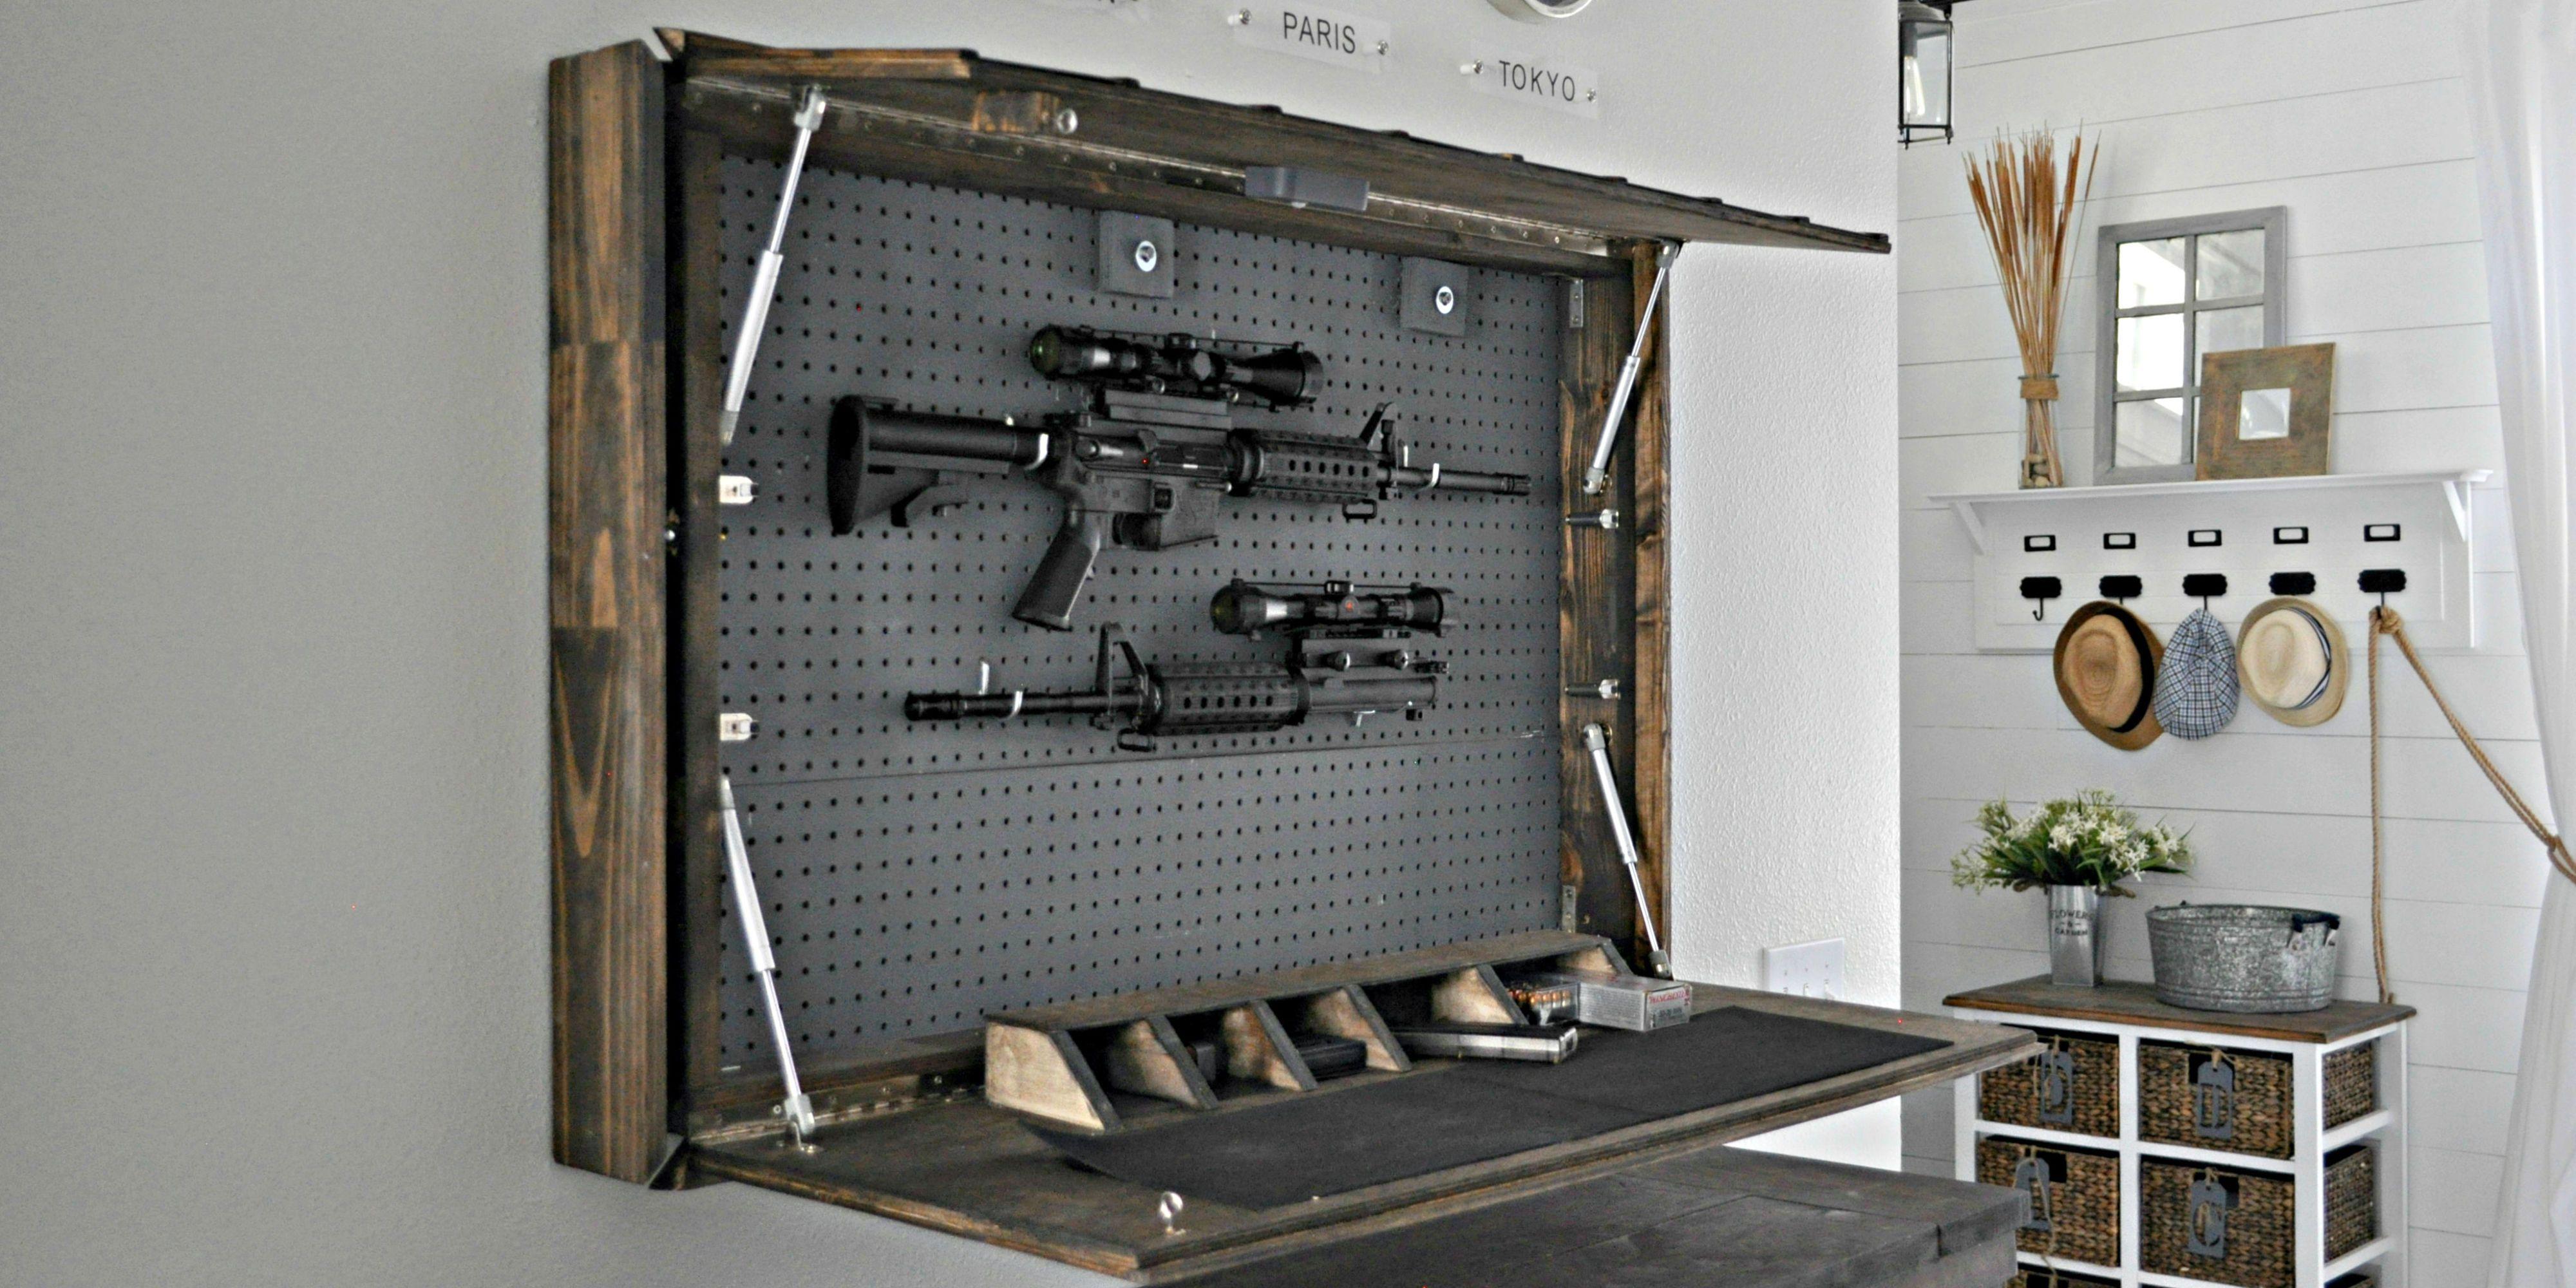 Secret DIY Gun Compartment Hides Behind a Mirror